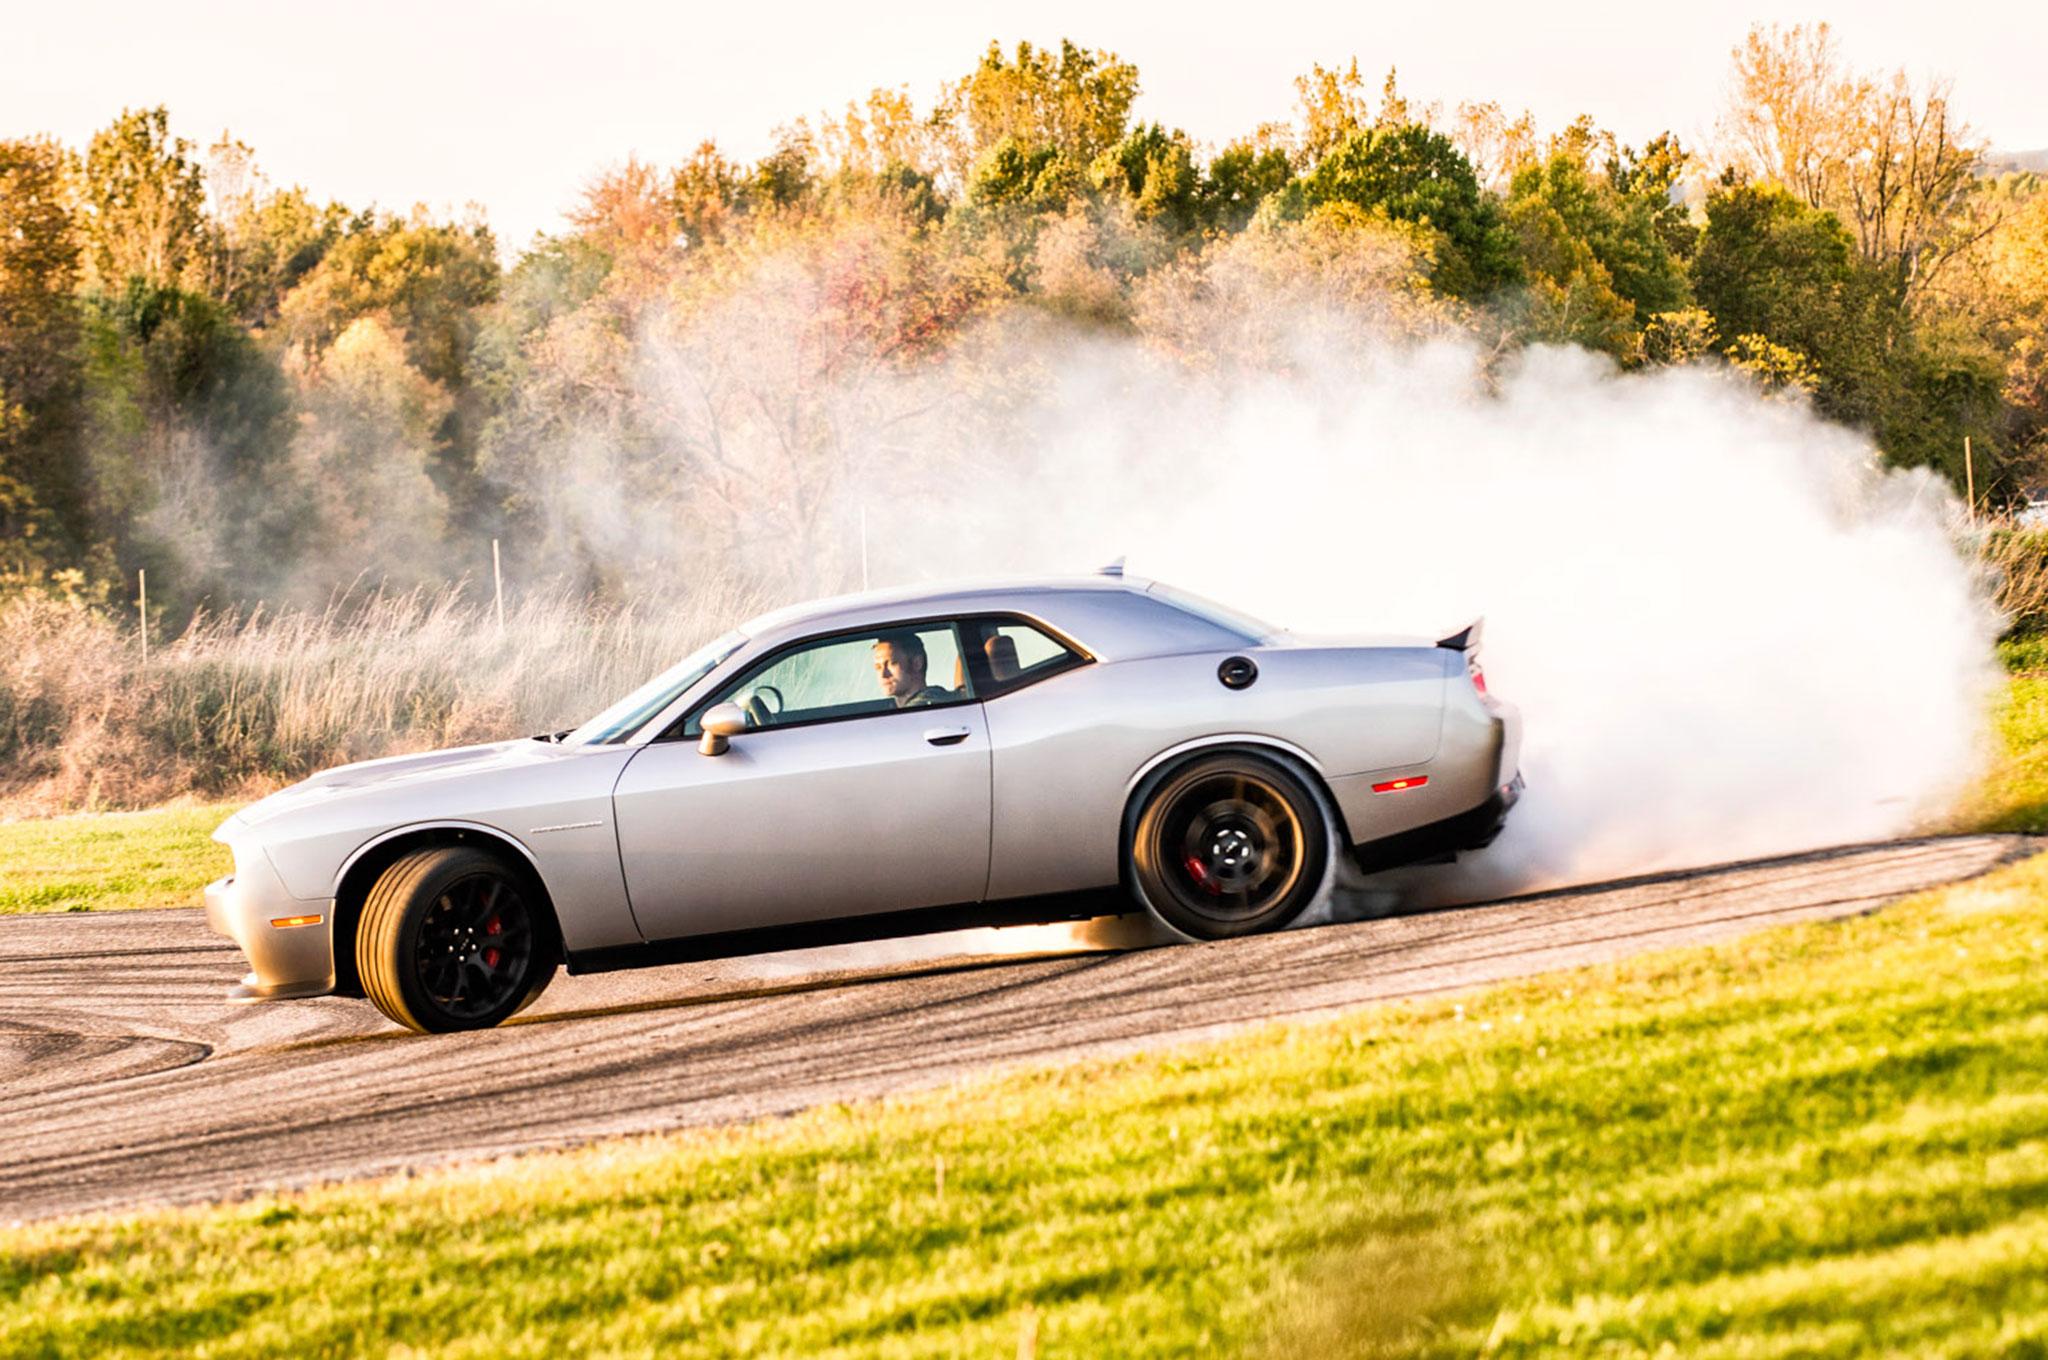 A 20 Second Burnout In A 2015 Dodge Challenger Srt Hellcat